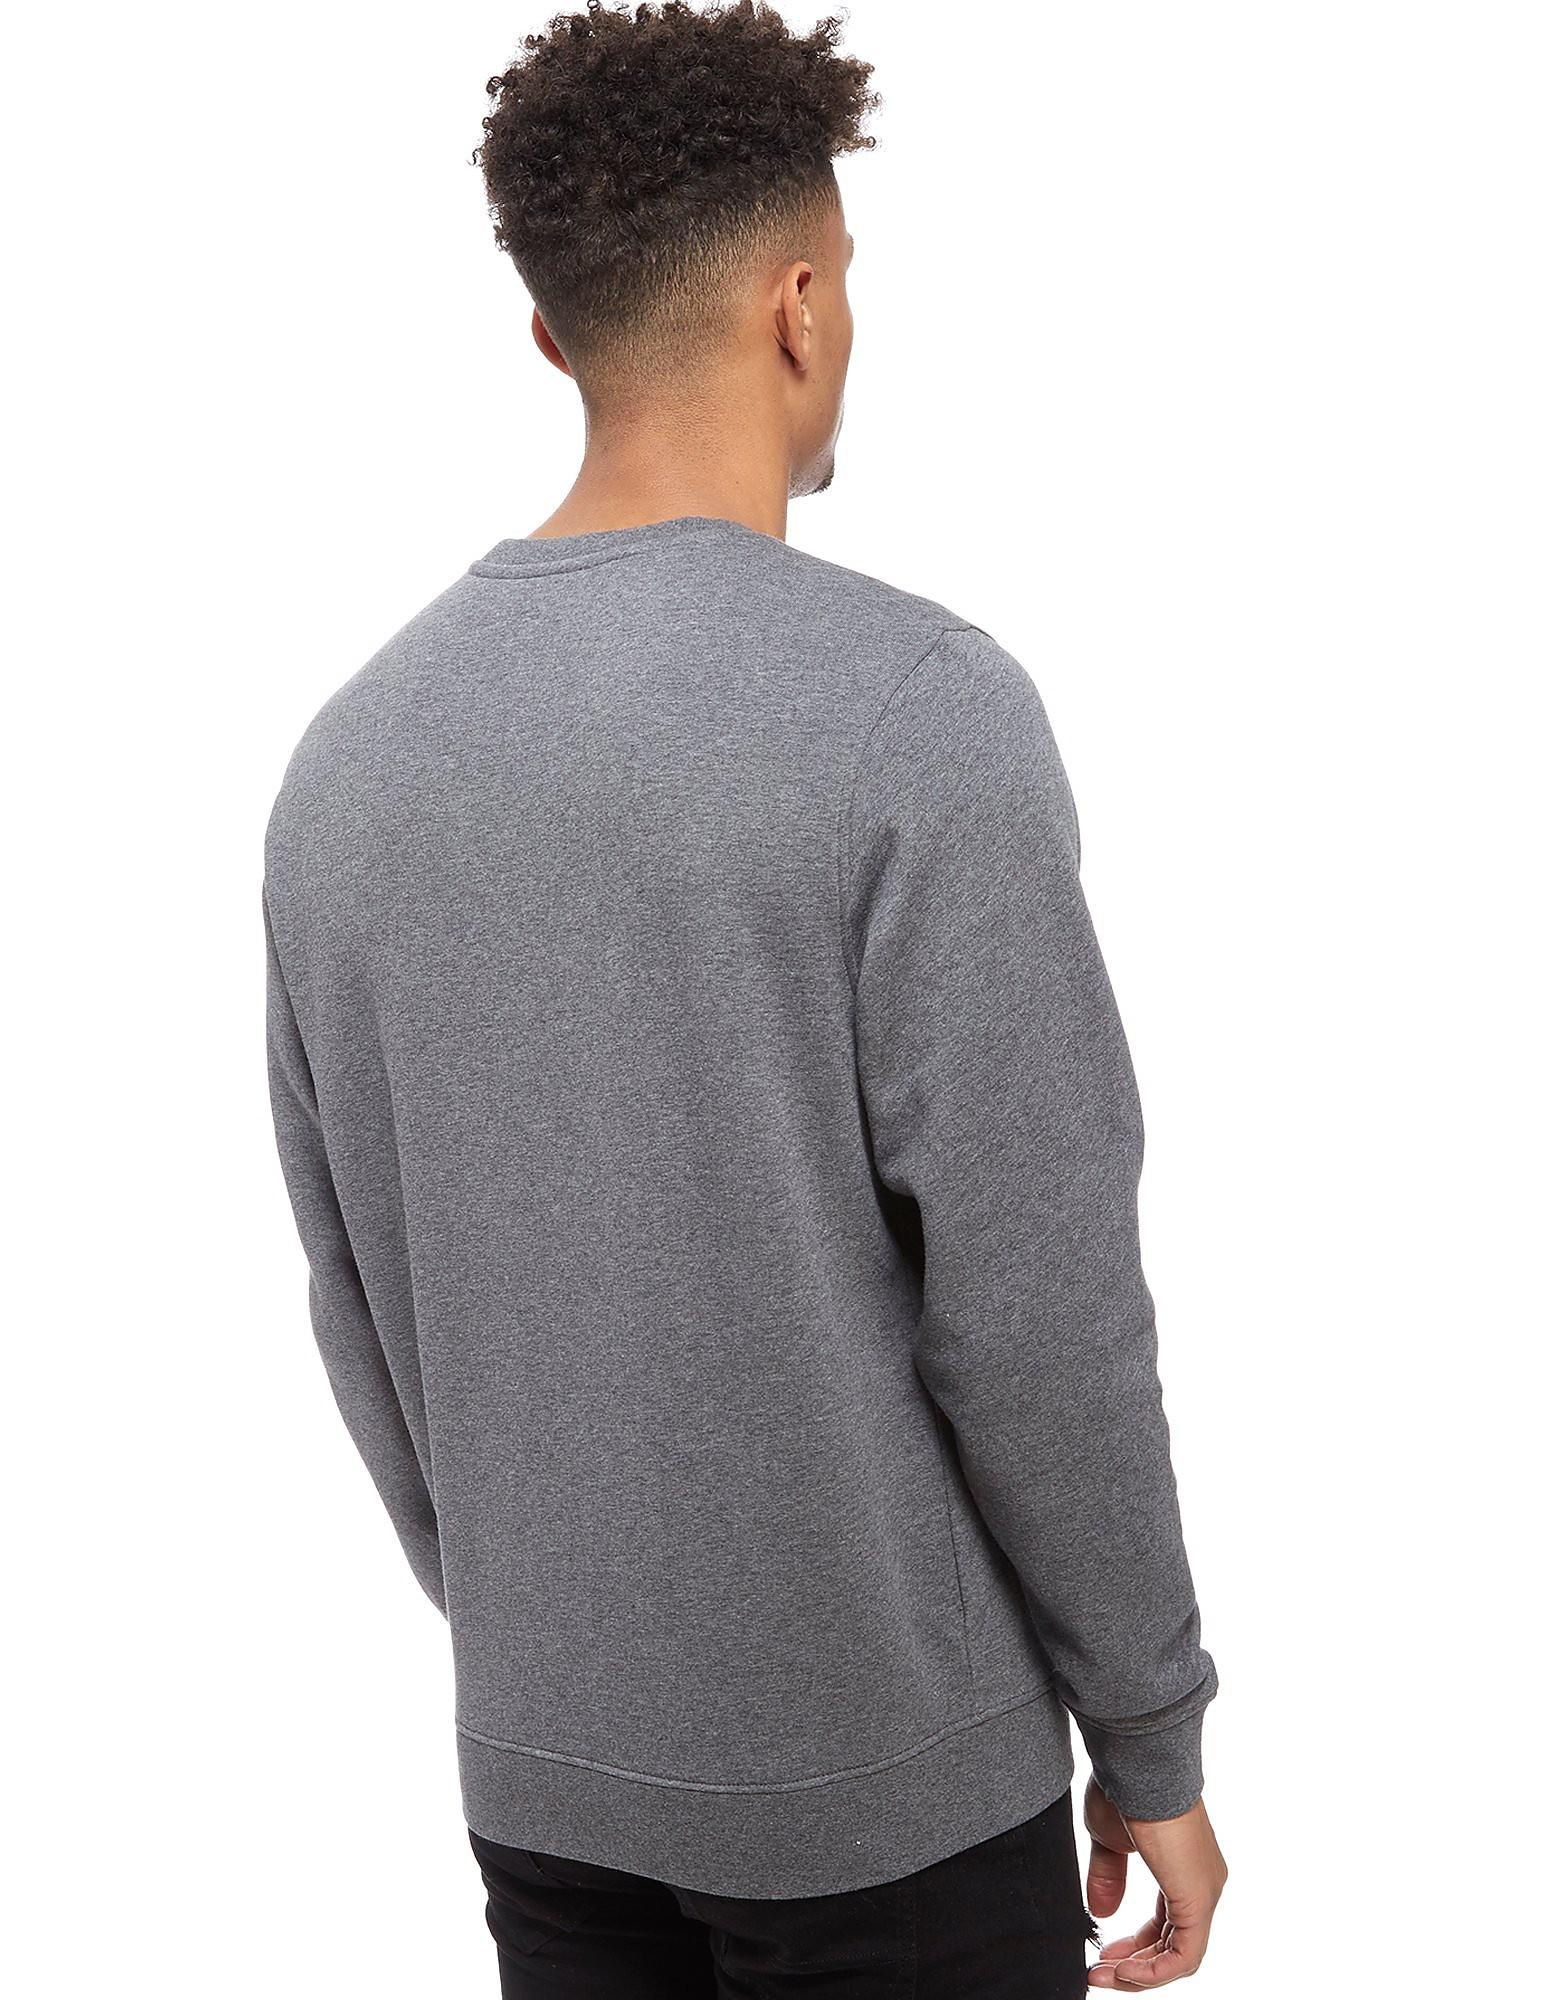 Lacoste Core Sweatshirt